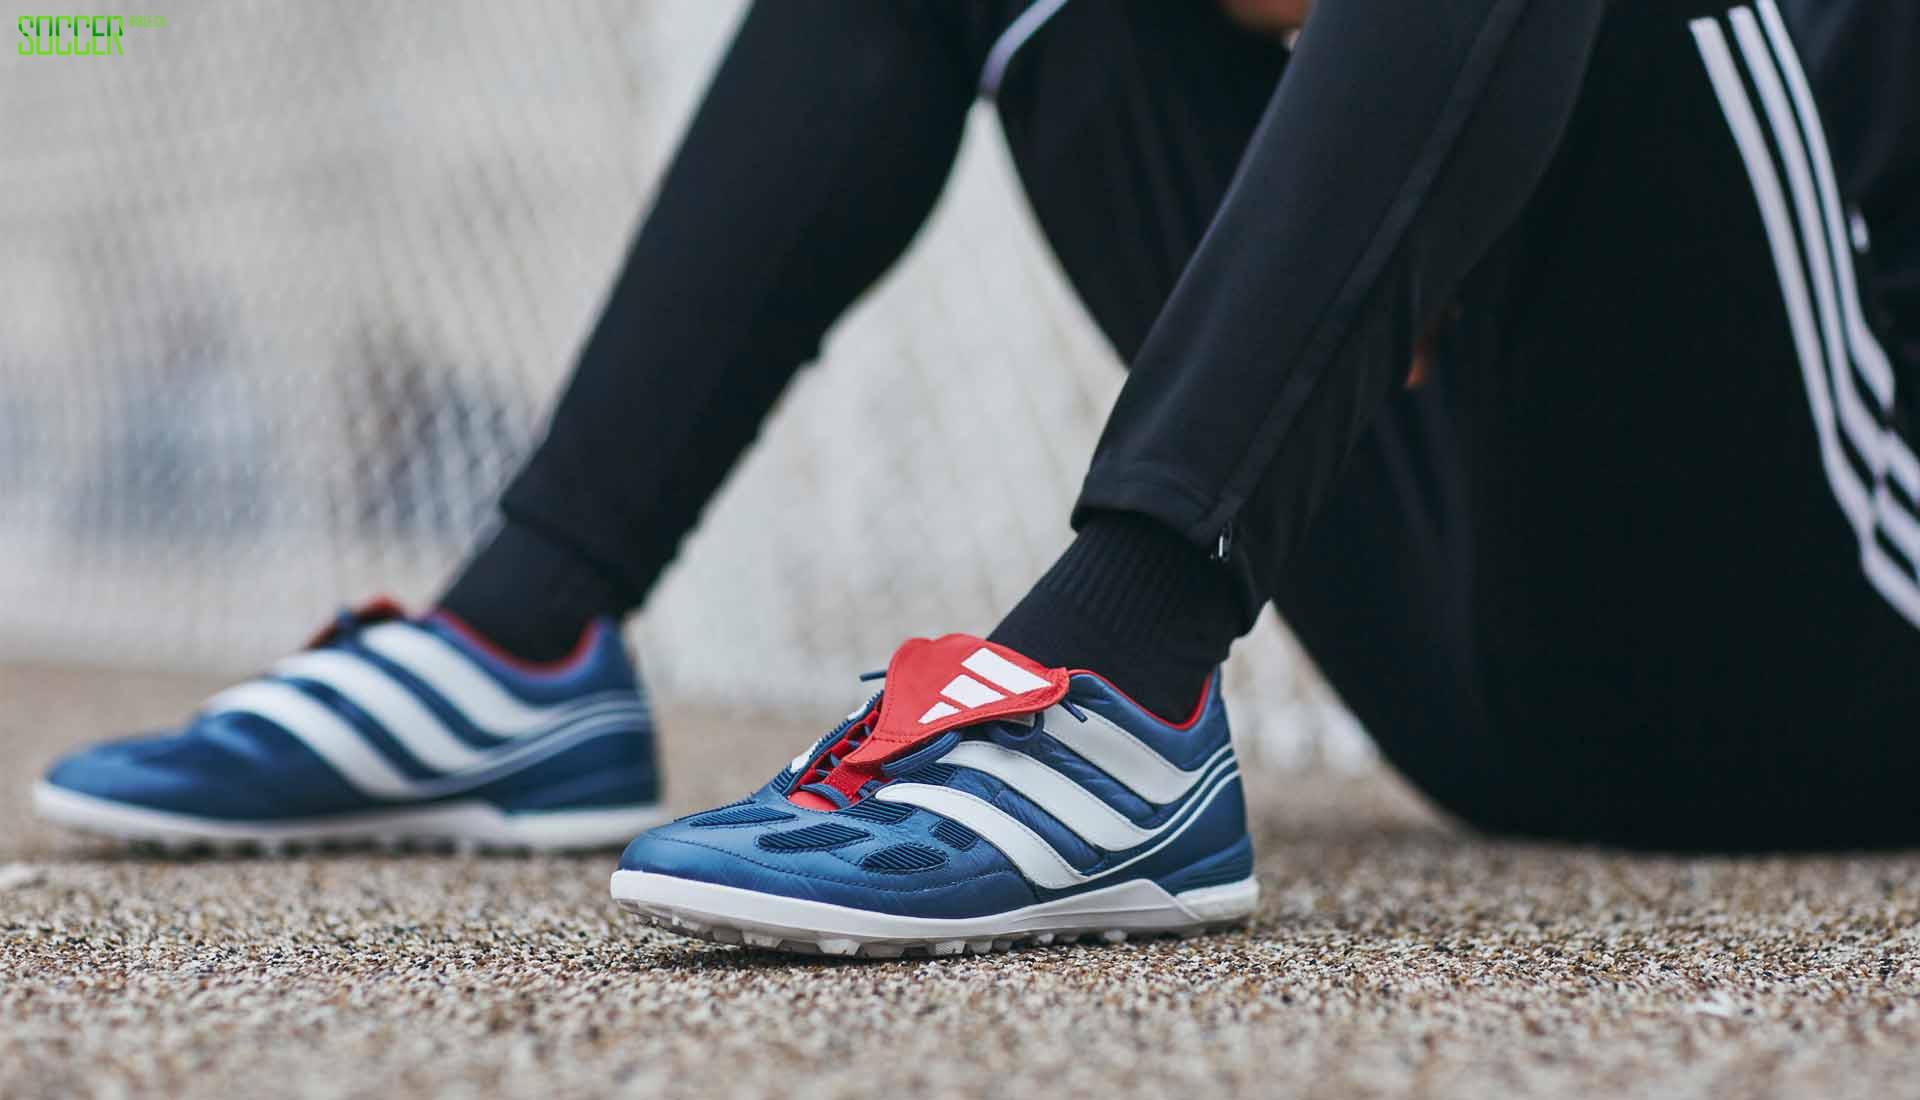 adidas-predator-precision-turf-1-min